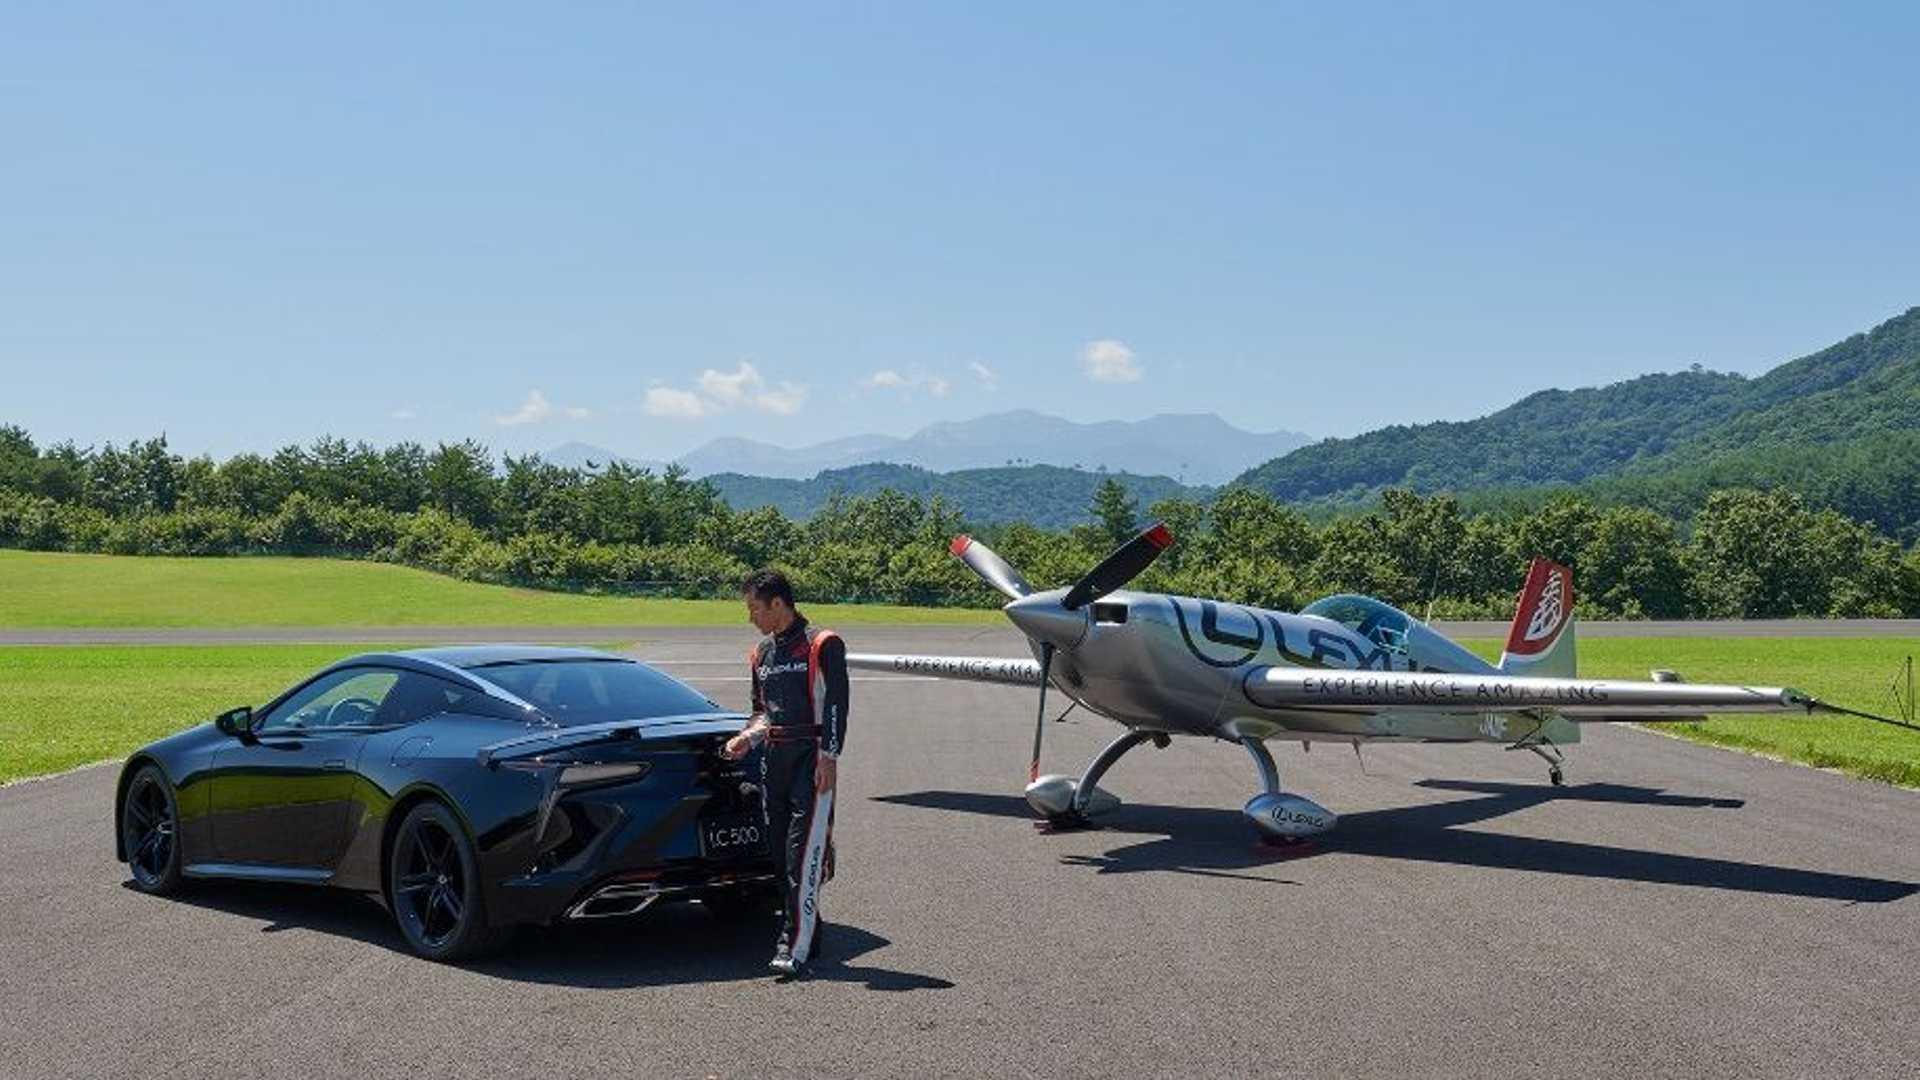 2021-lexus-lc-aviation-jdm-4